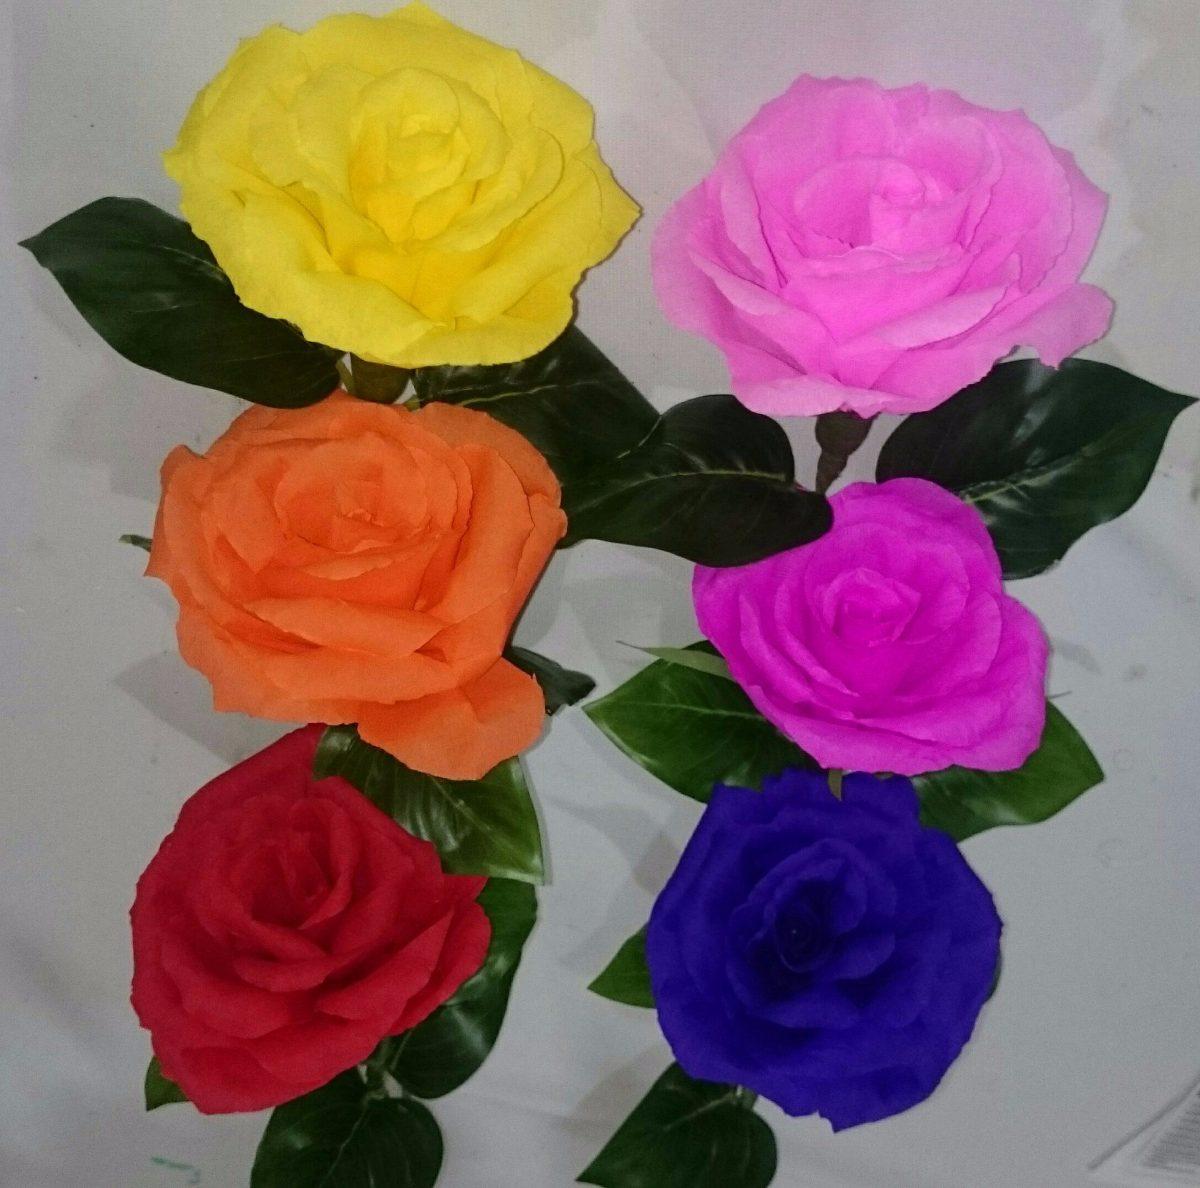 Hacer Flor Papel Trendy Flores Con Papel De Seda With Hacer Flor